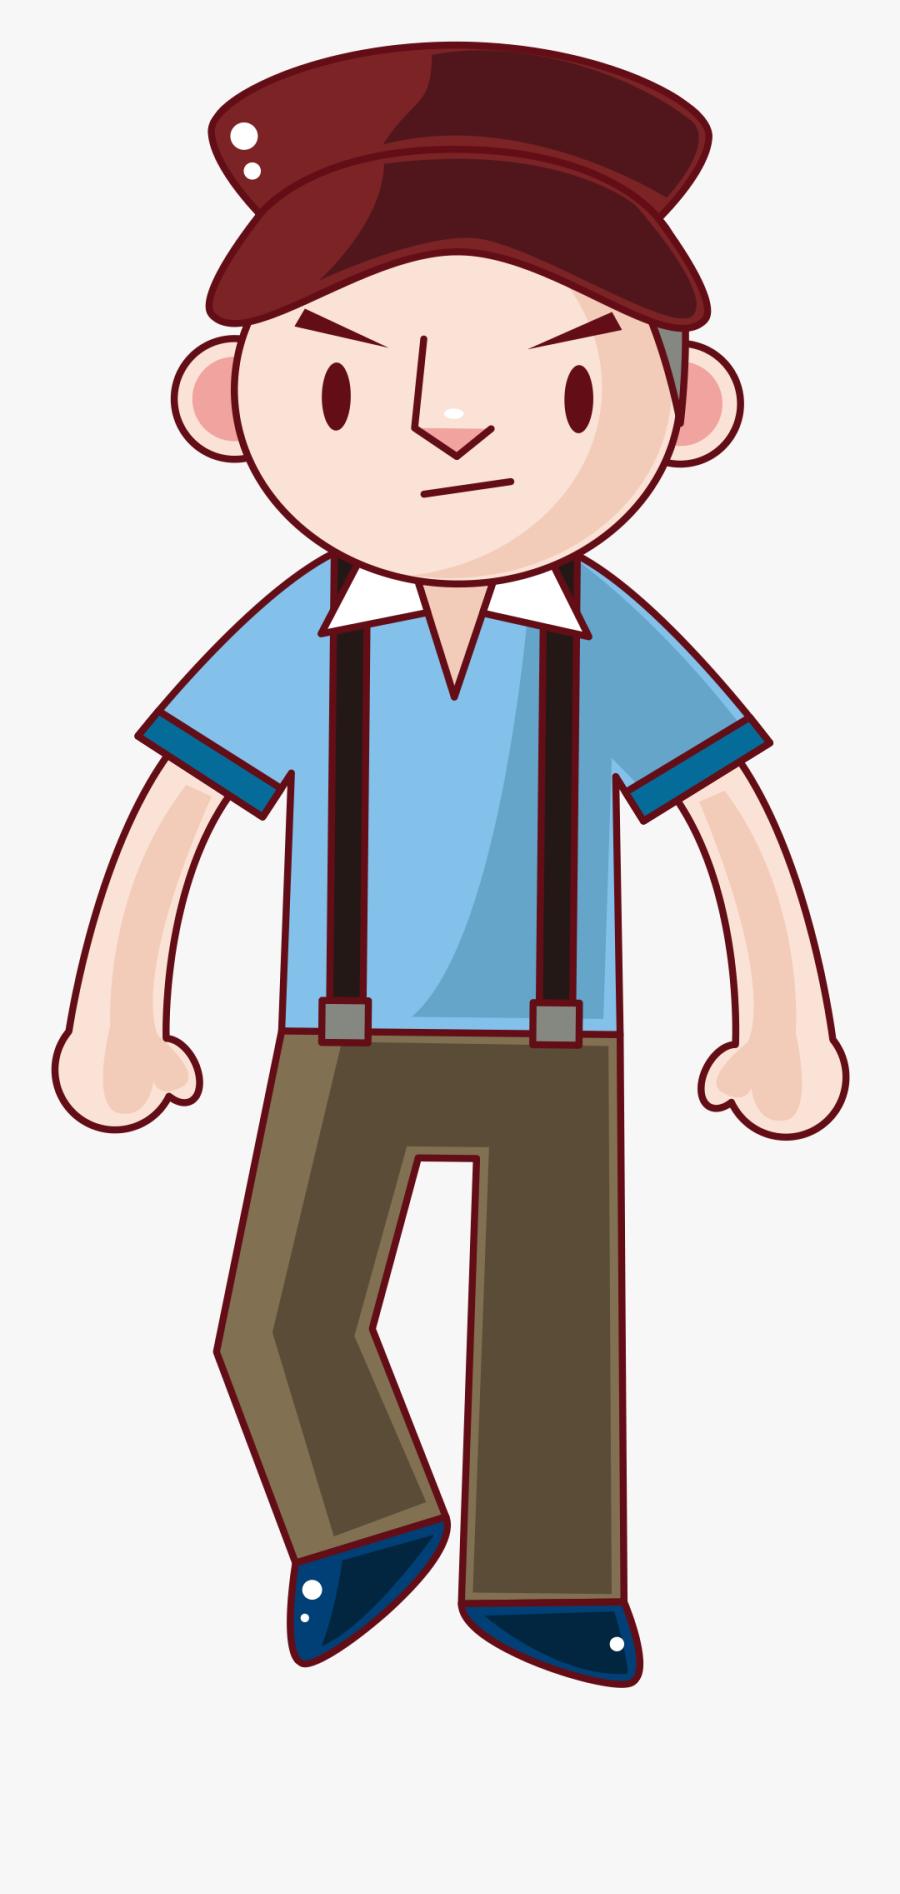 Anime Boy Clipart Human Male - Portable Network Graphics, Transparent Clipart